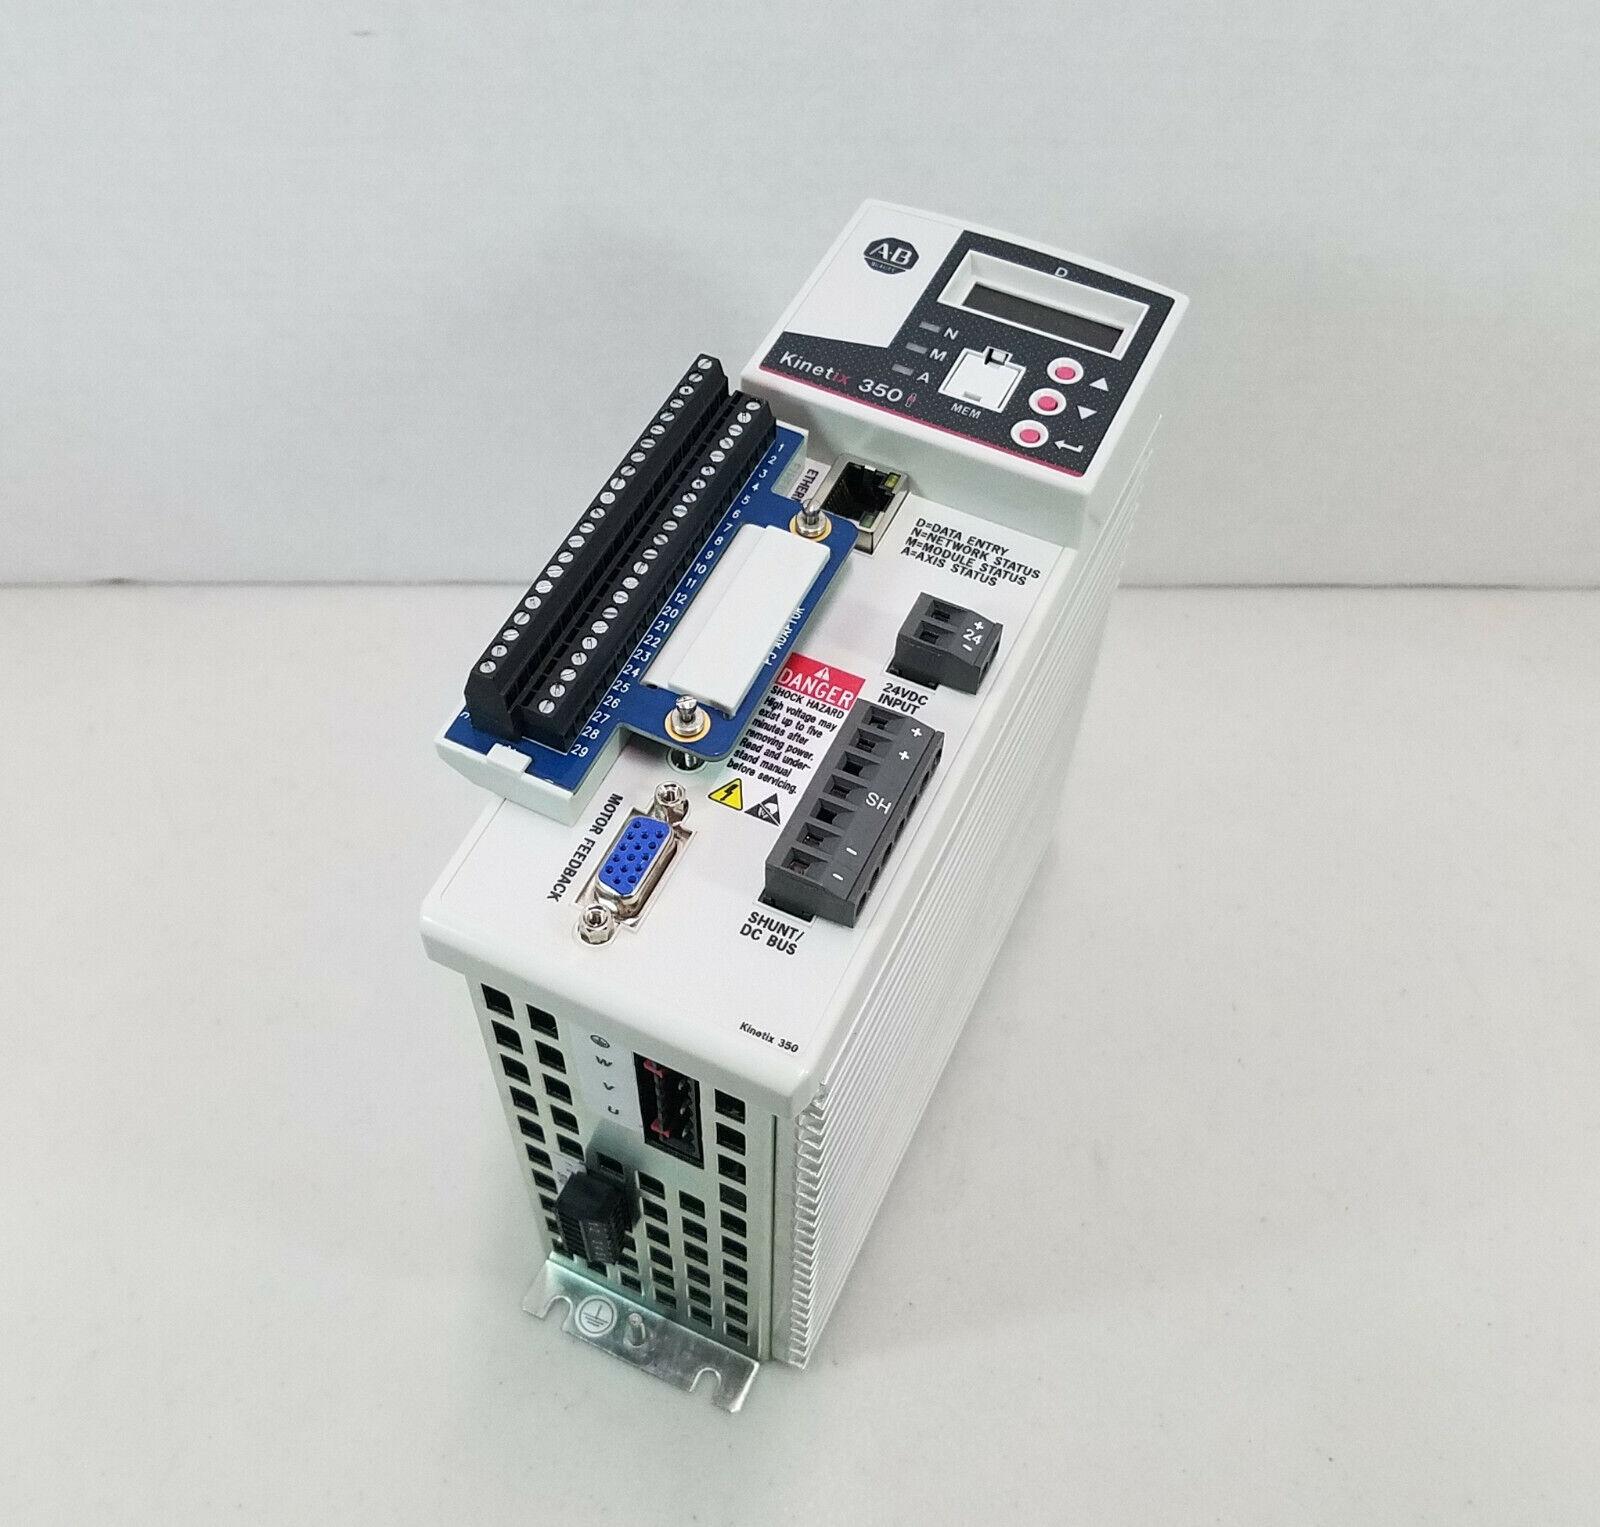 Allen Bradley 2097-V33PR3-LM Kinetix 350 Single Axis Servo Drive w/  EtherNet/IP